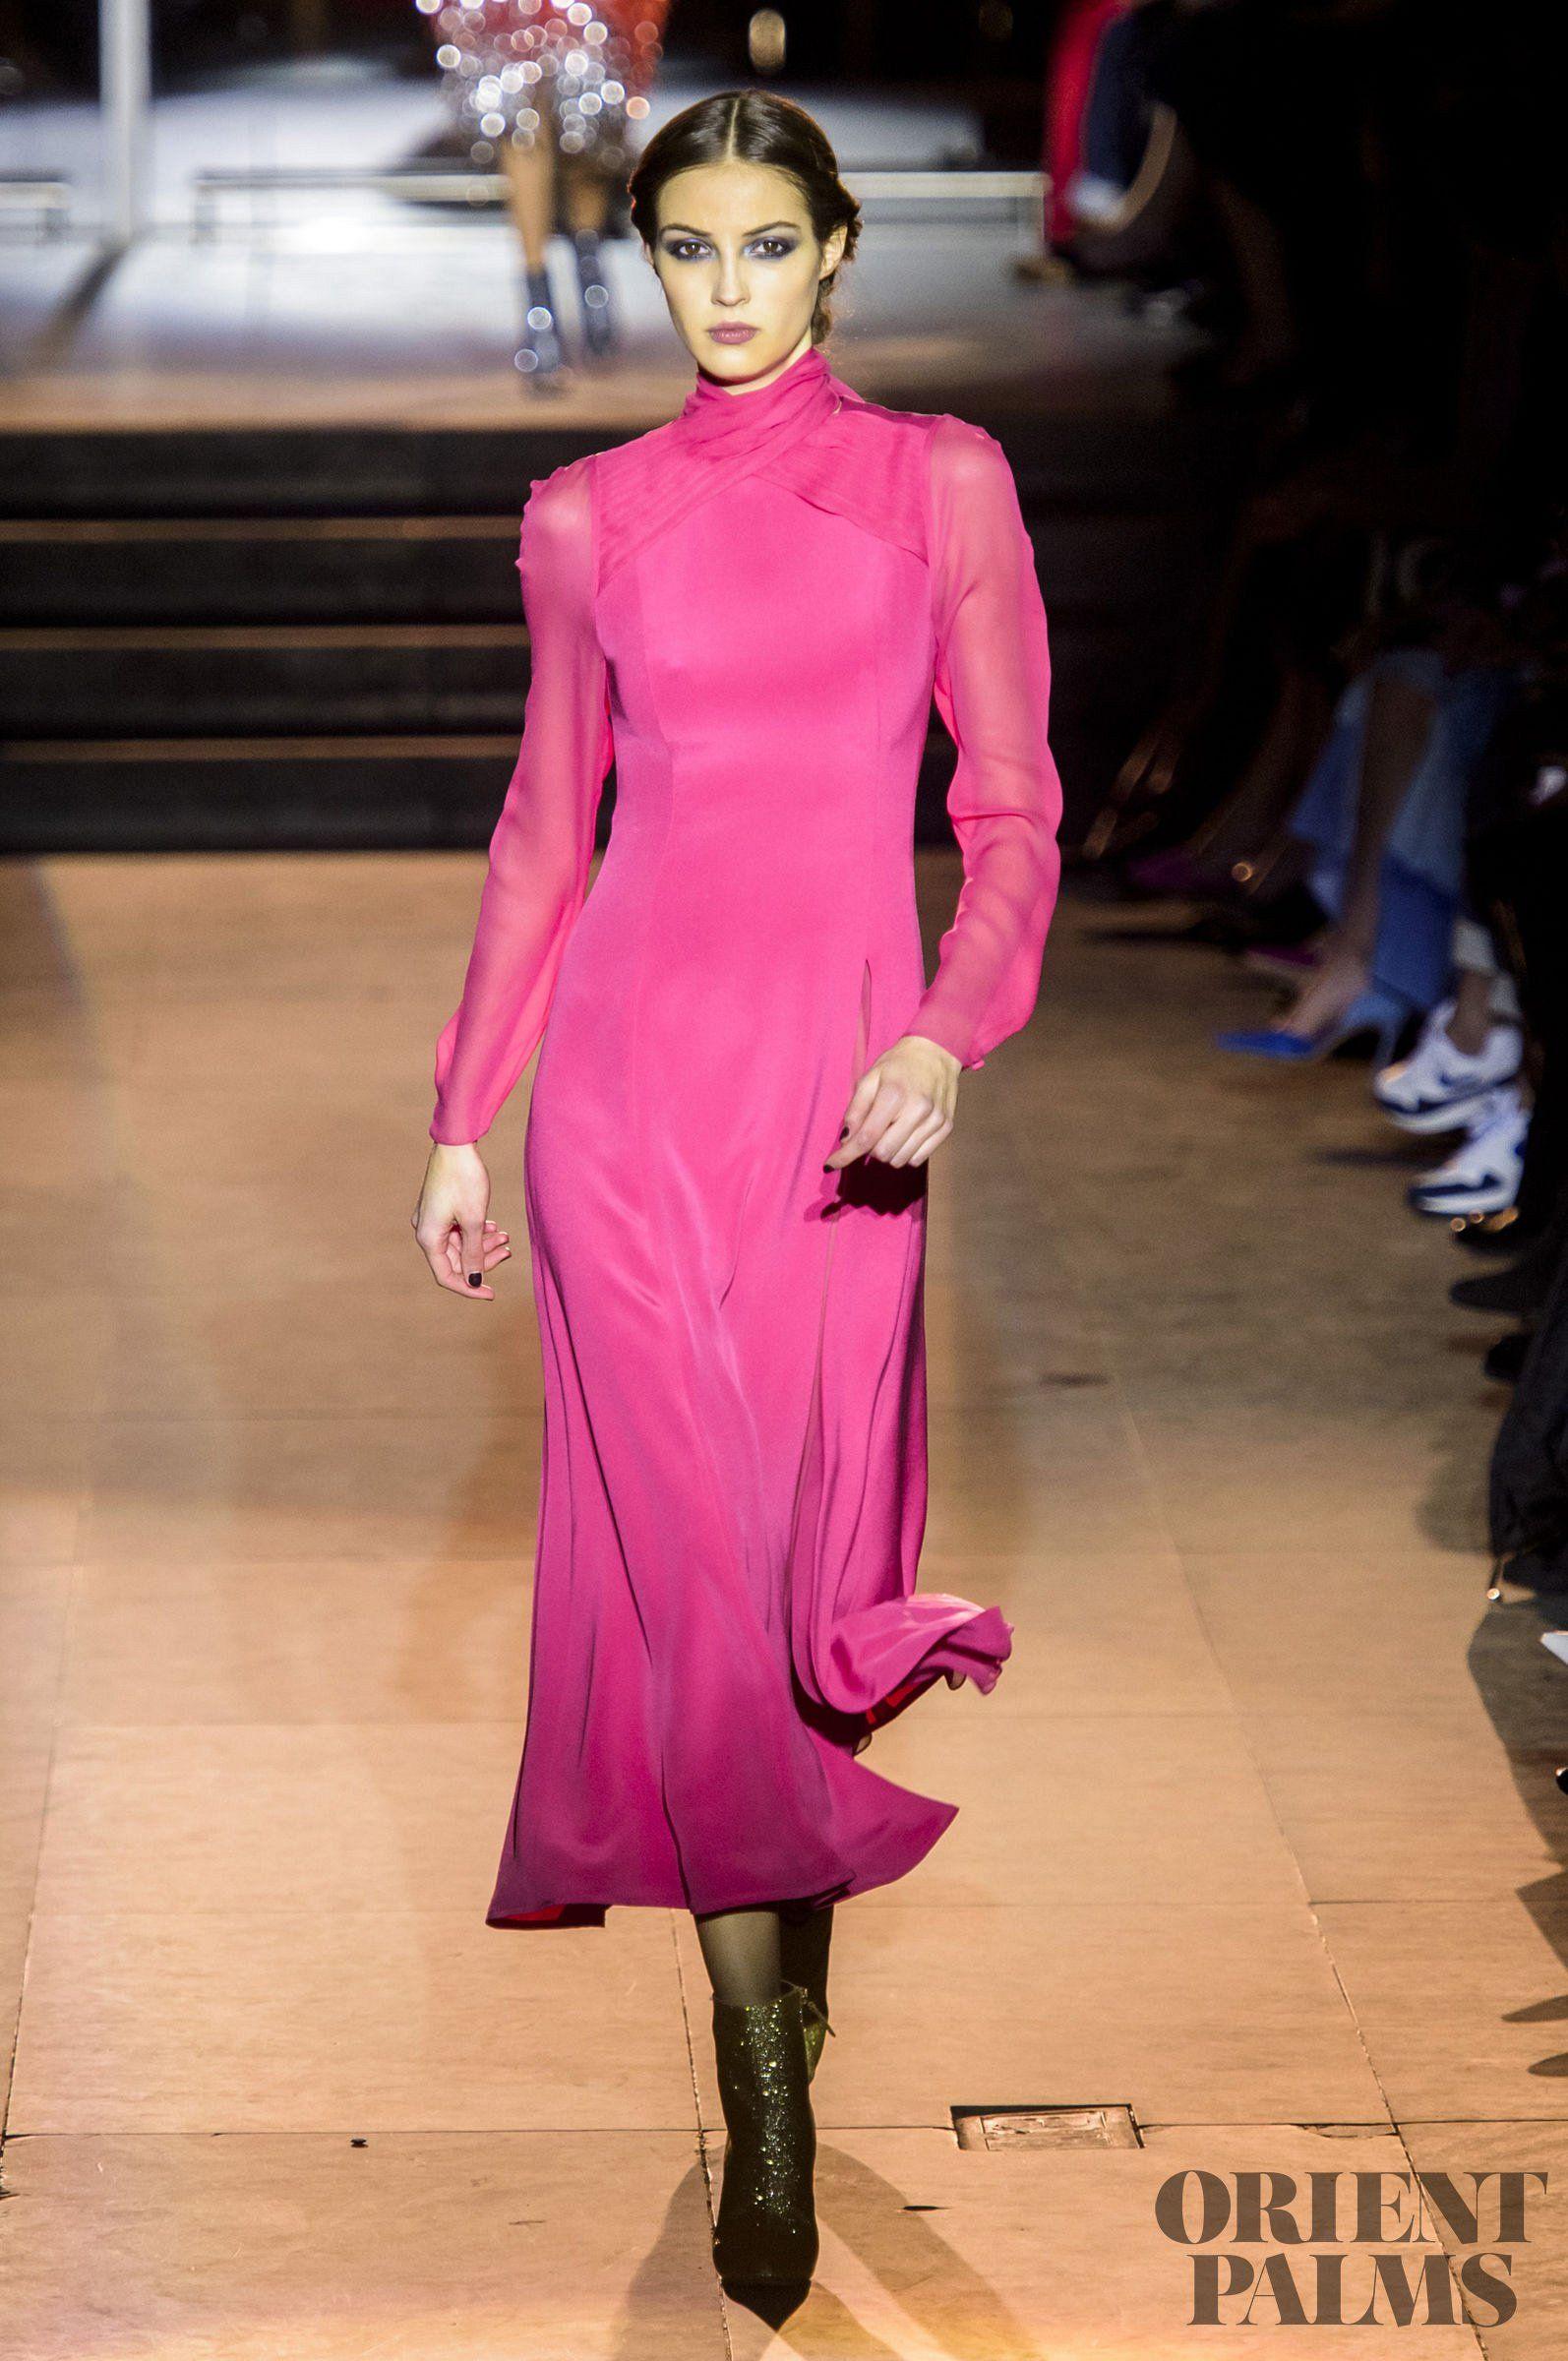 pictures 2019 Winter Trend: 15 Midi Sweater Dresses